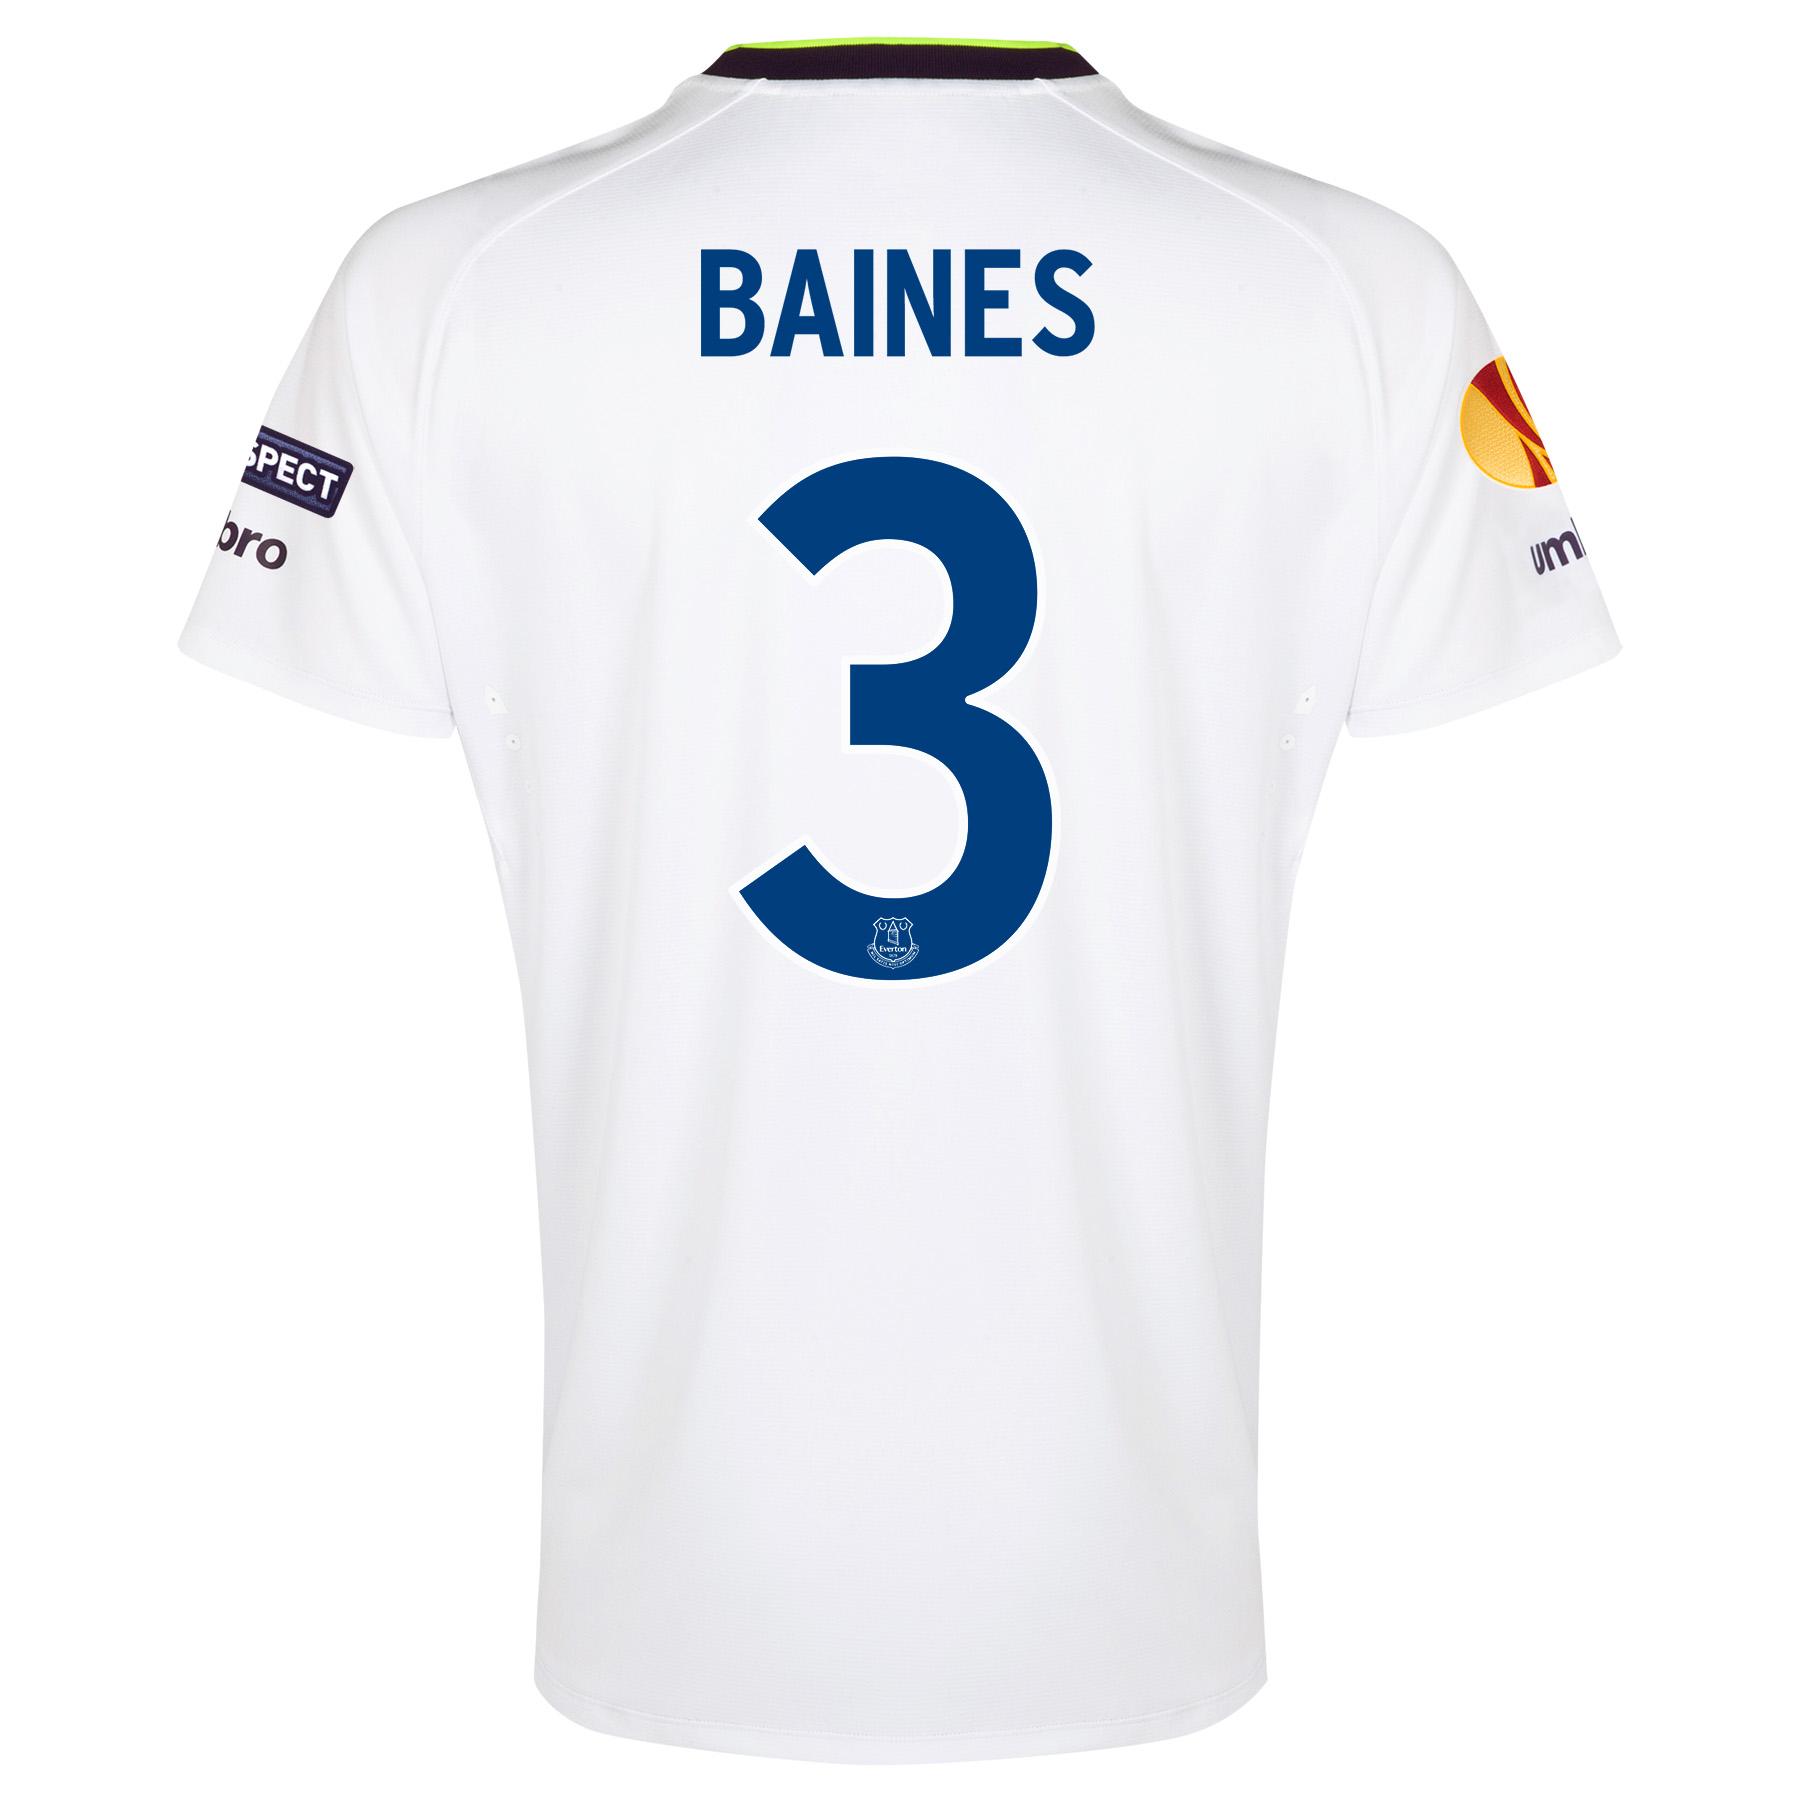 Everton UEFA Europa League 3rd Shirt 2014/15 with Baines 3 printing